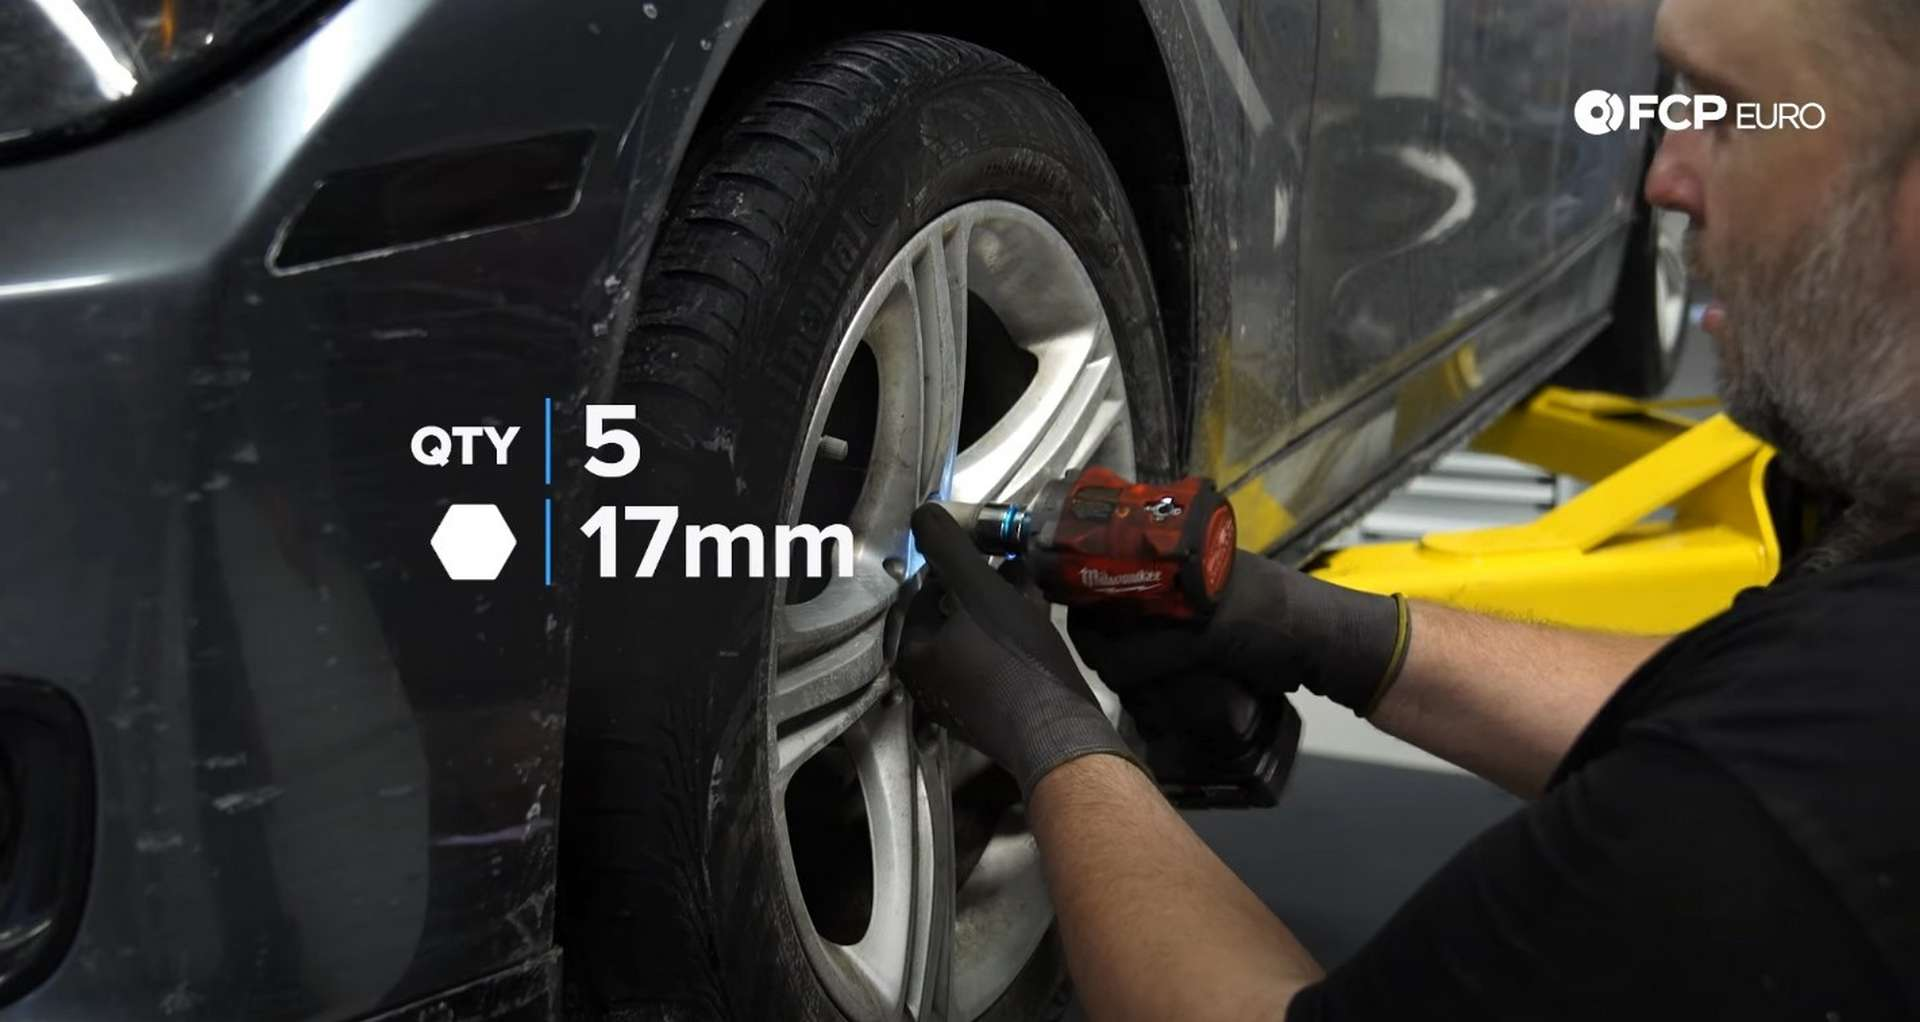 01-DIY-BMW-F30-Front-Brake-Service_Removing-The-Caliper